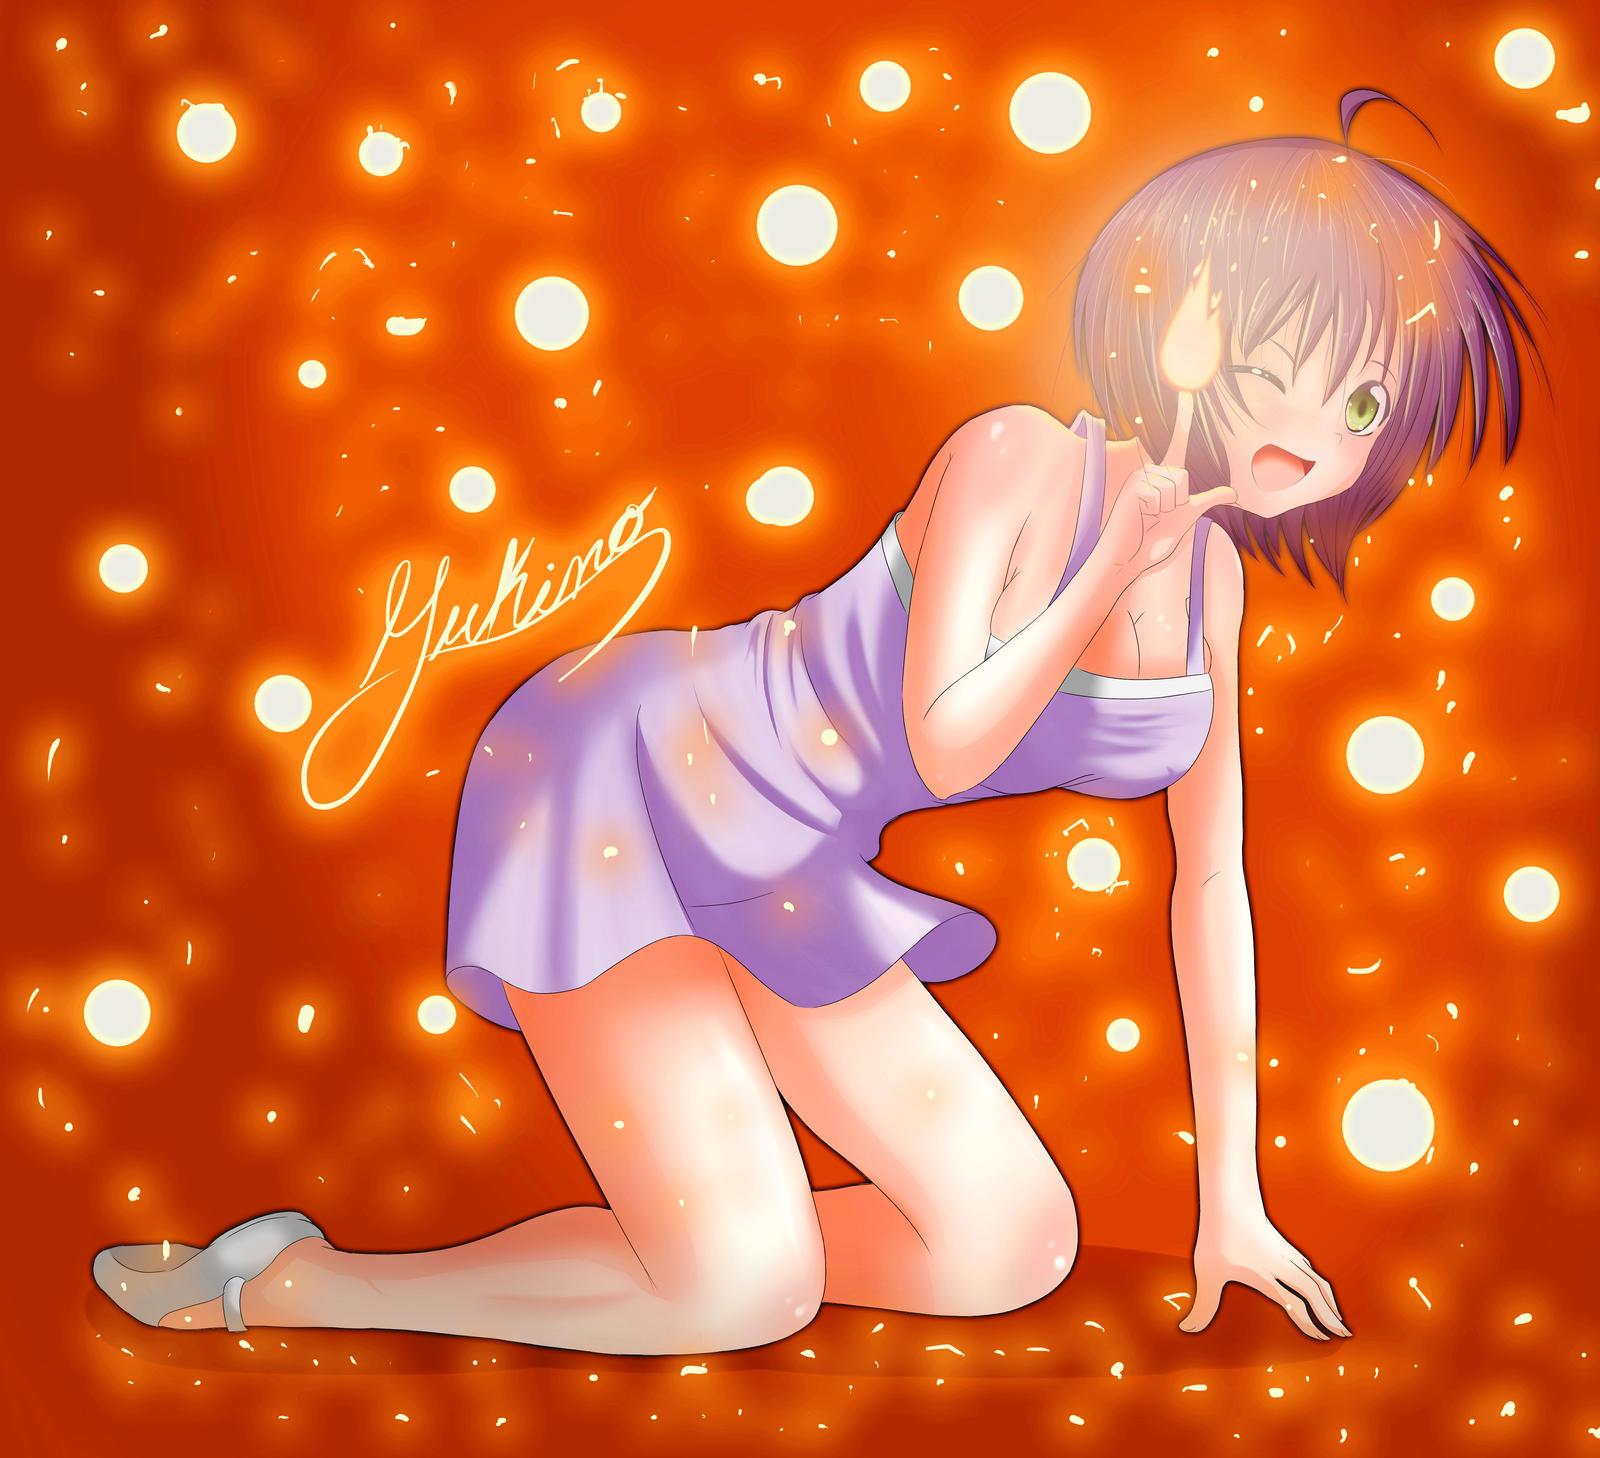 Yukino by Mastordeo